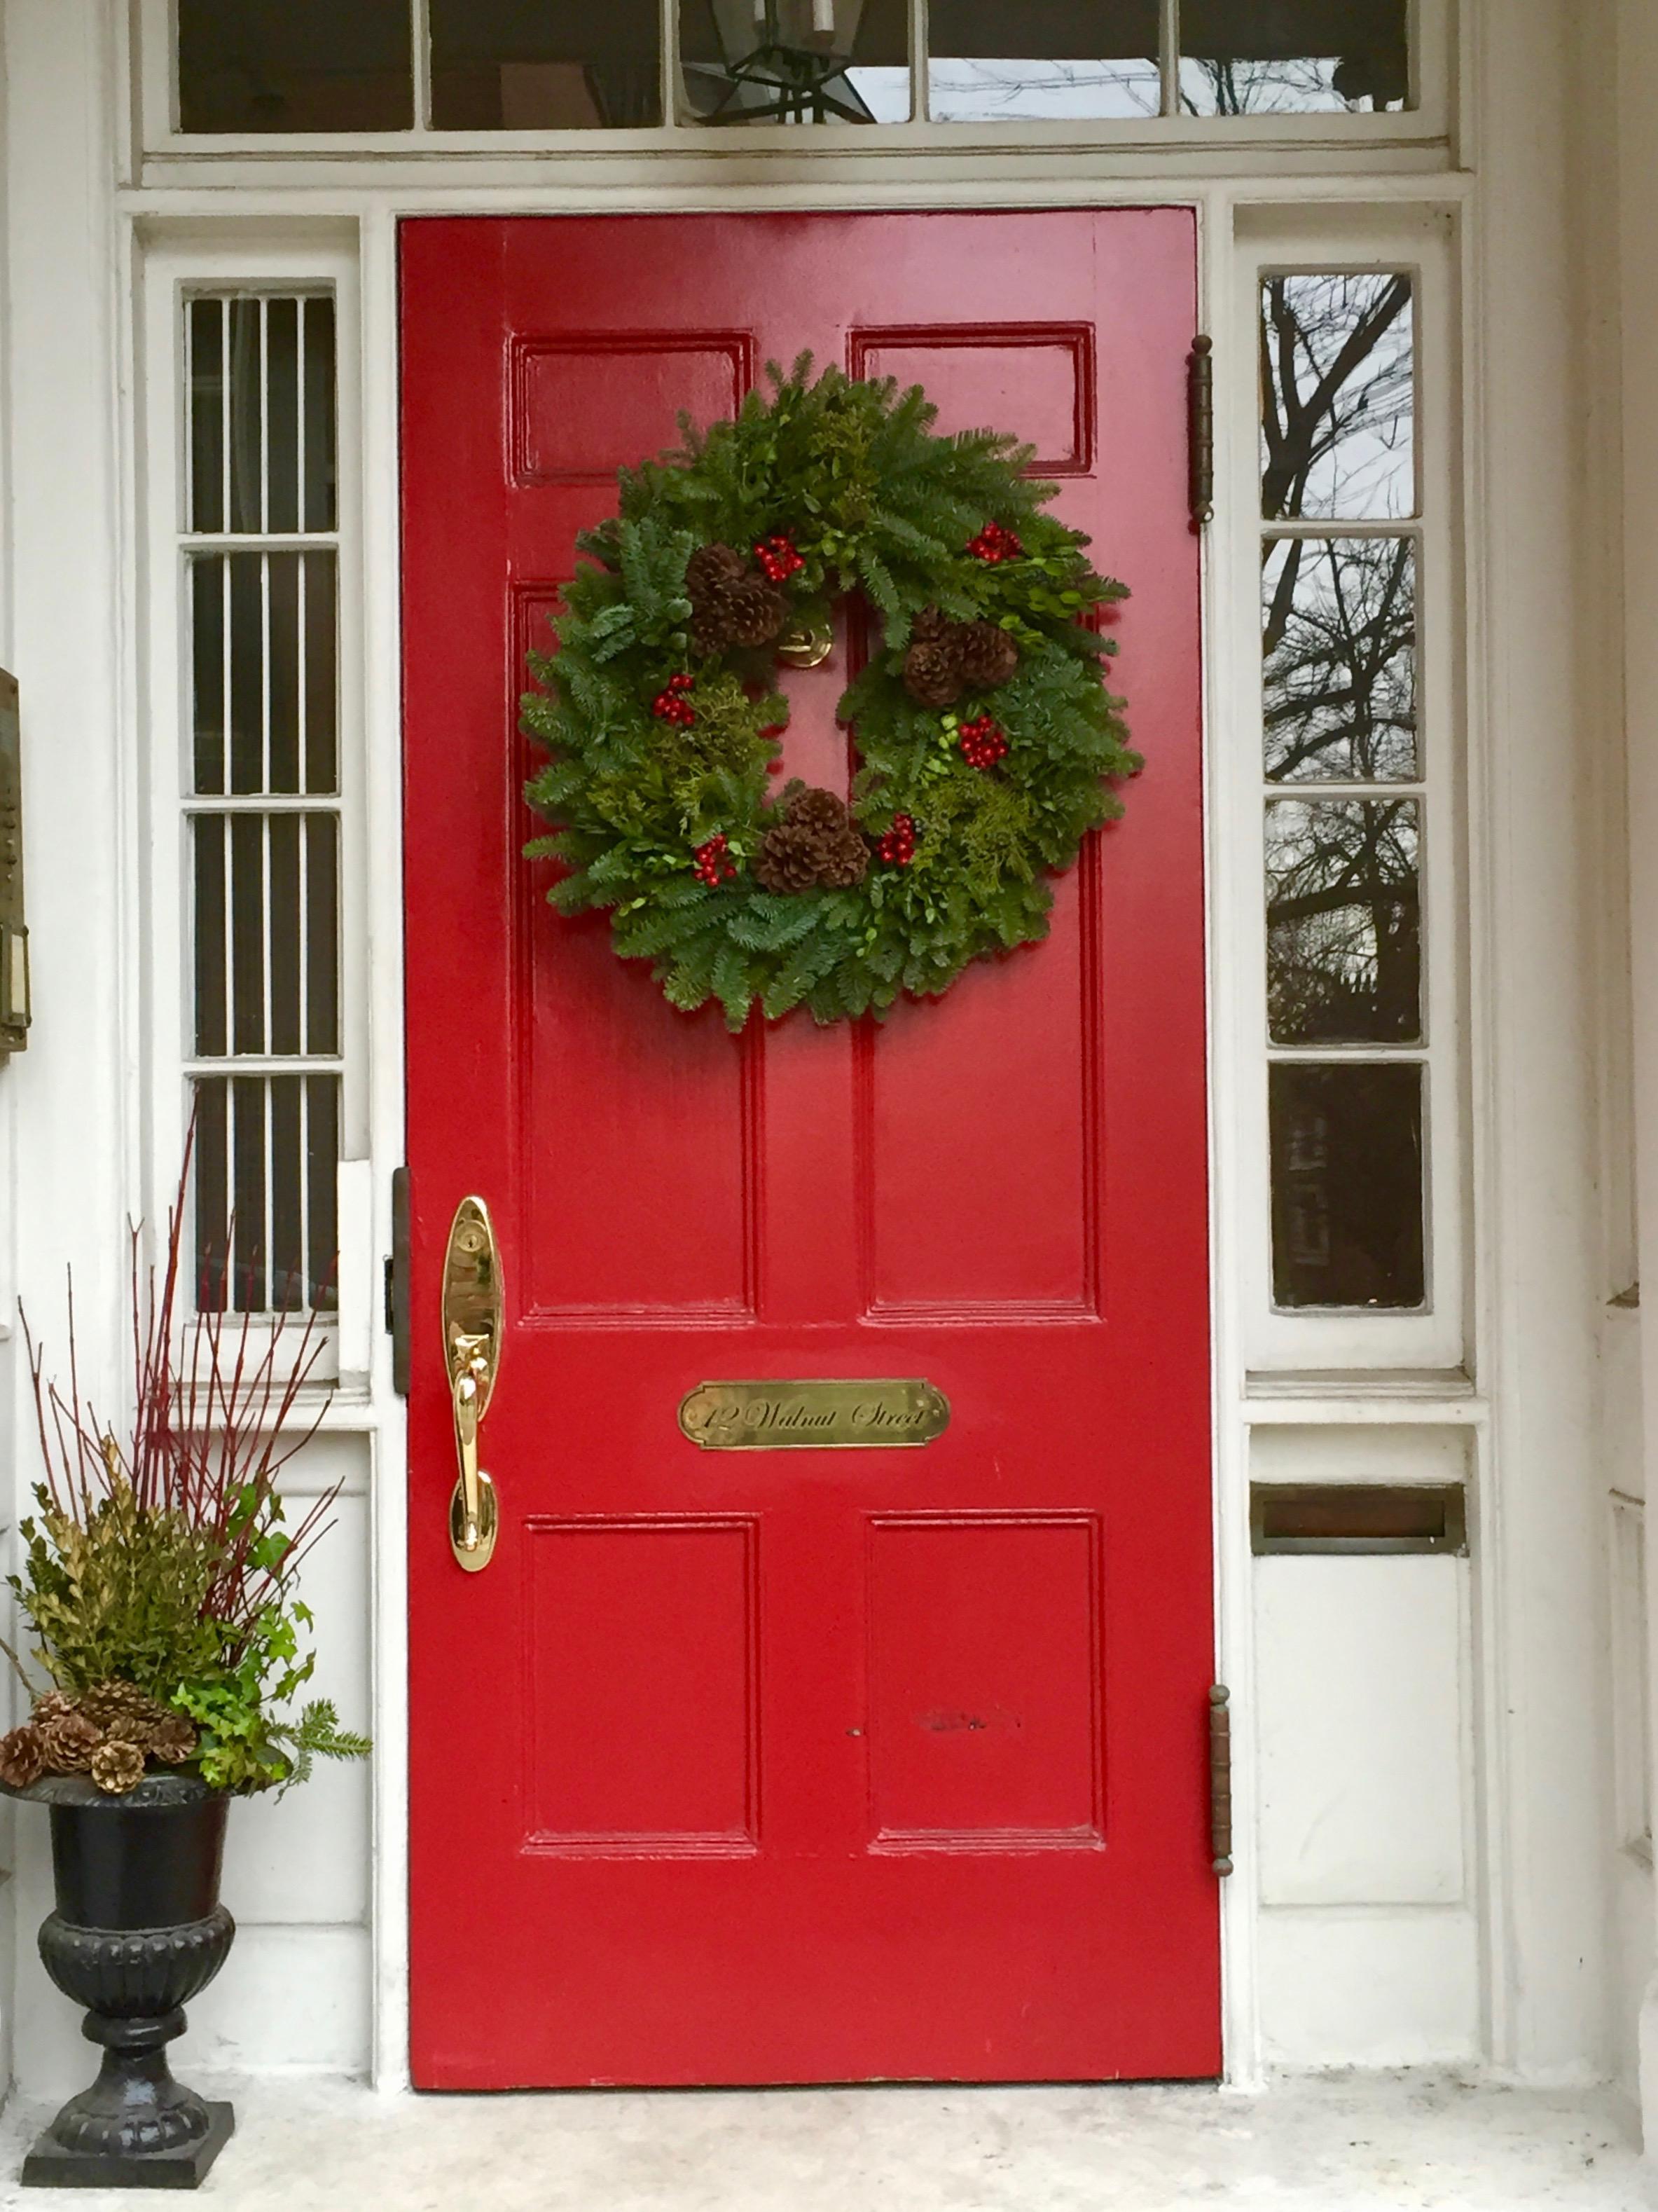 Christmas Wreath Front Door Beacon Hill New England.jpg